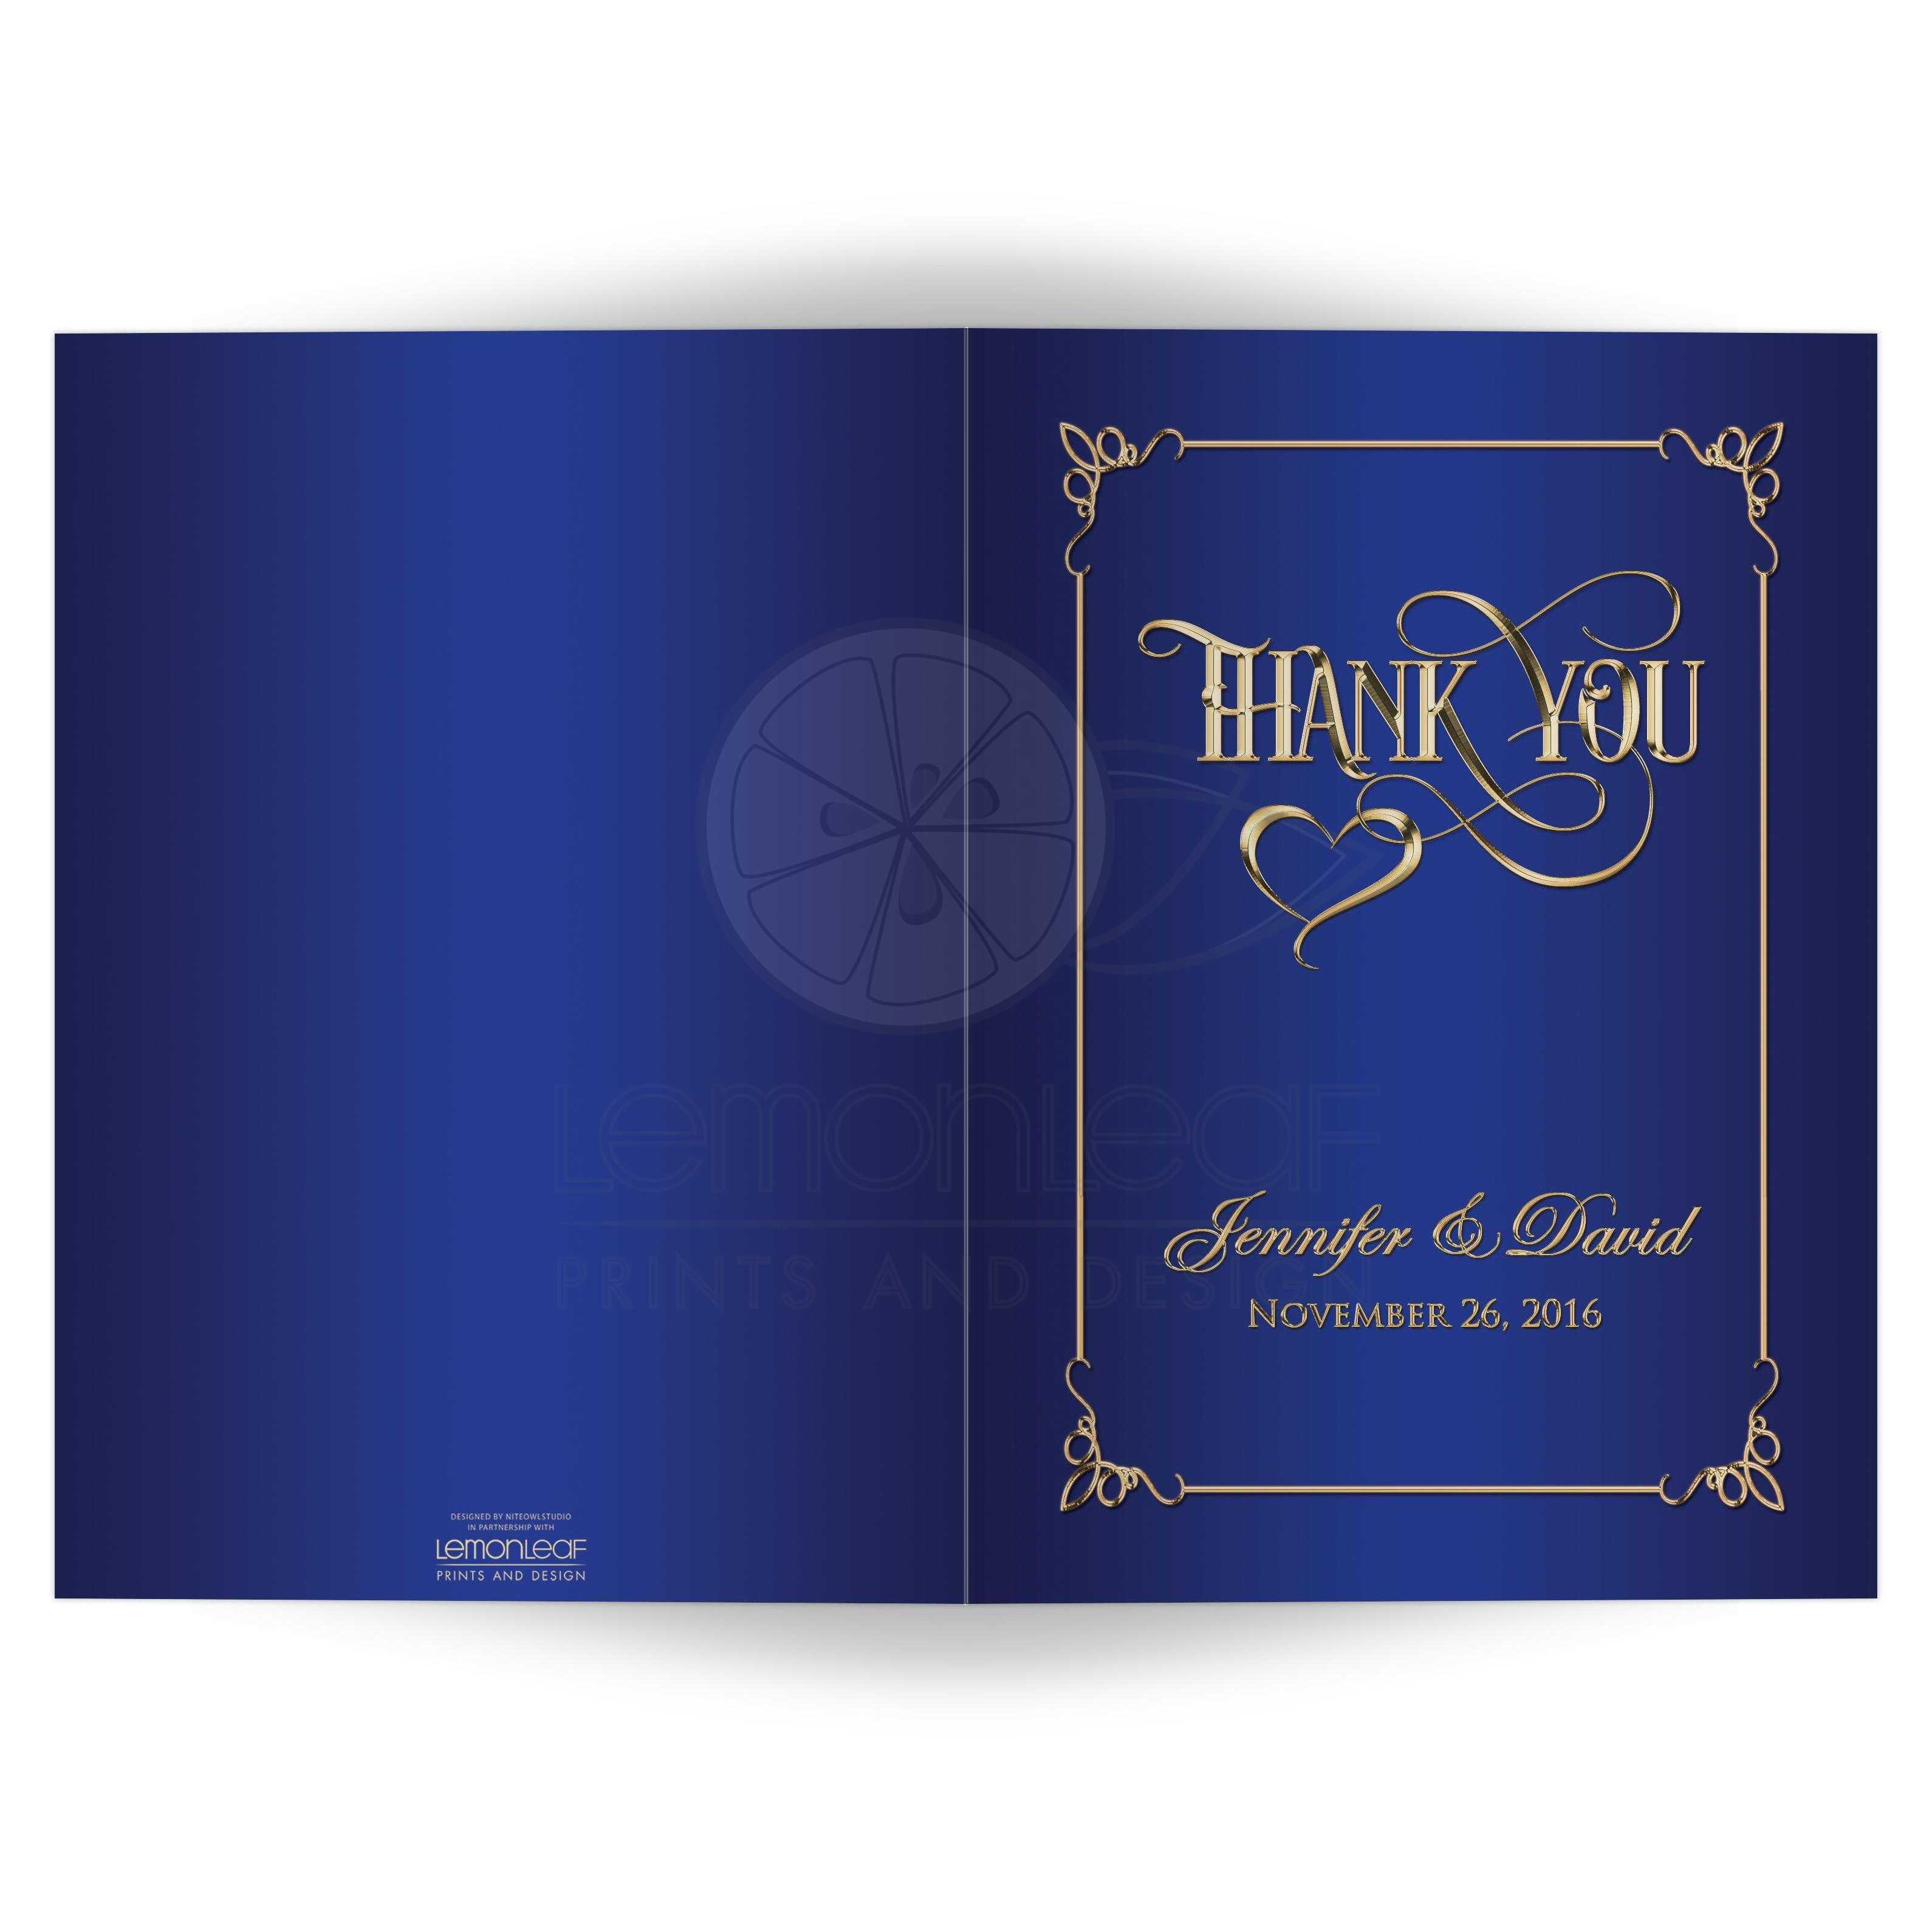 5x7 Photo Thank You Card Royal Blue Gold Ornate Scrolls Heart